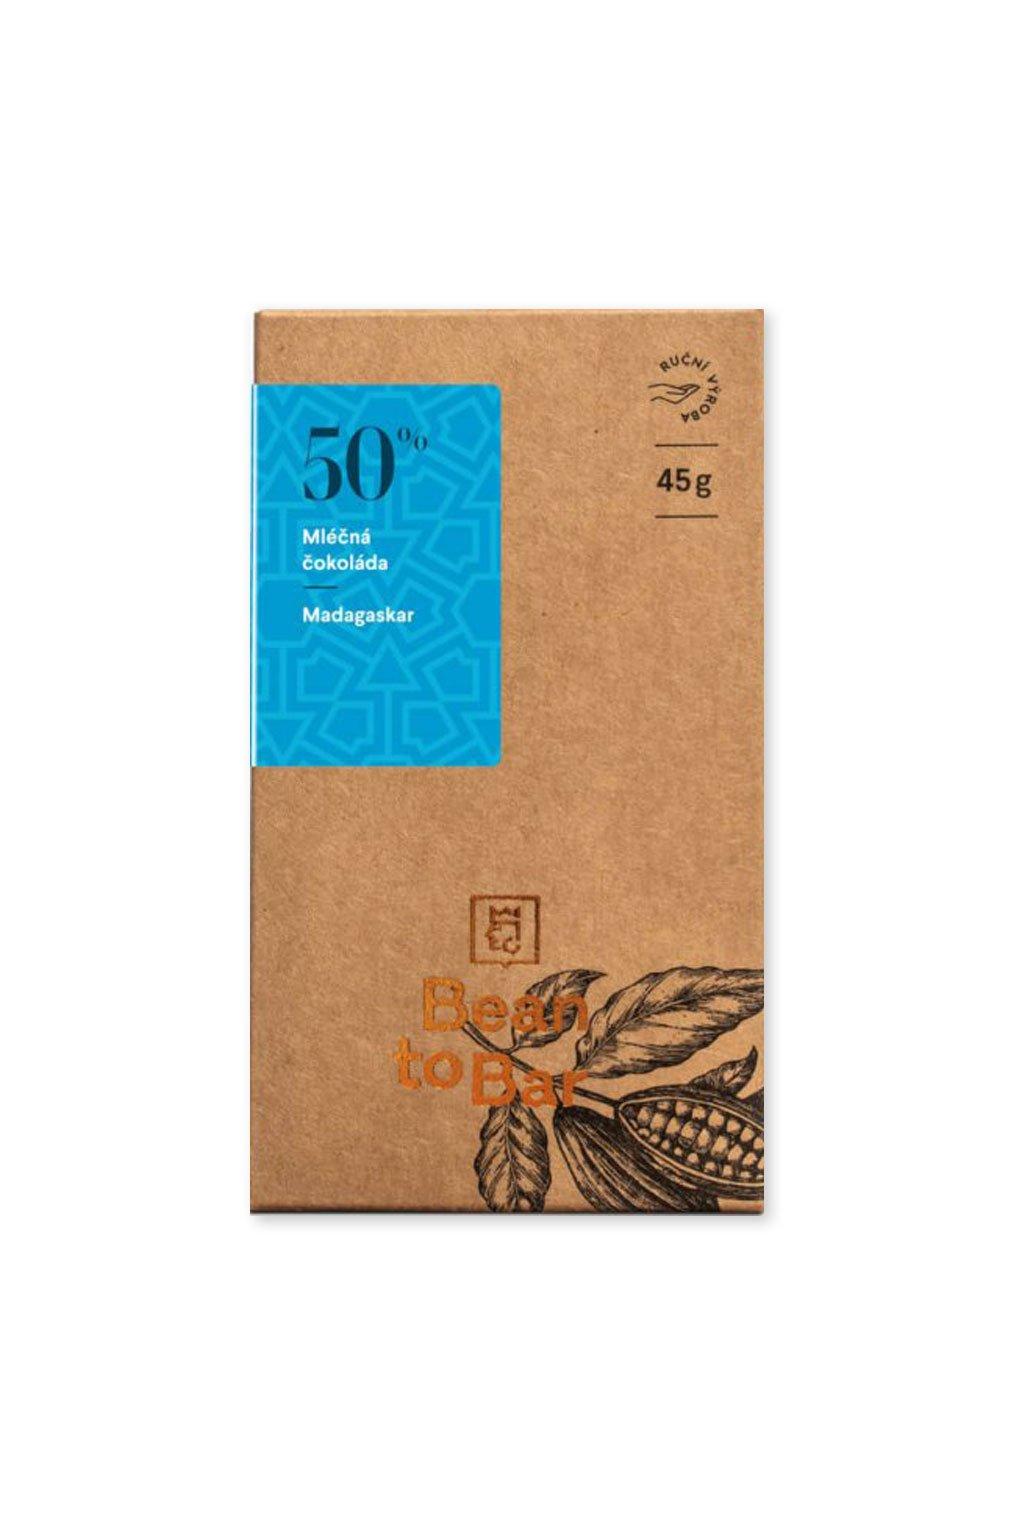 Čokoládovna Janek Mléčná 50% Madagaskar